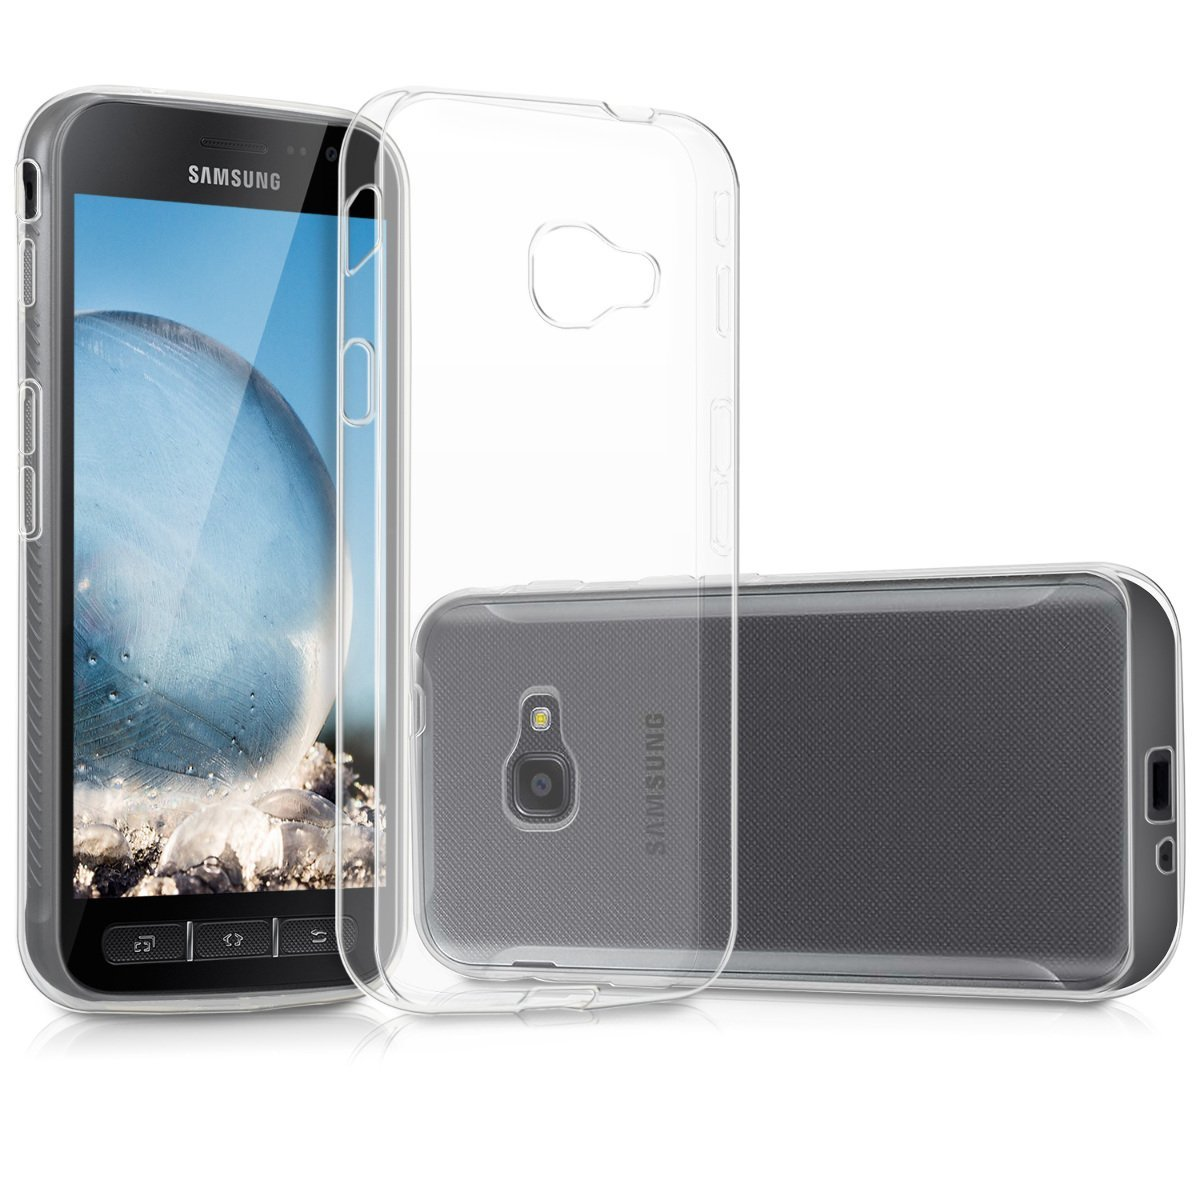 Handy Samsung Xcover 4